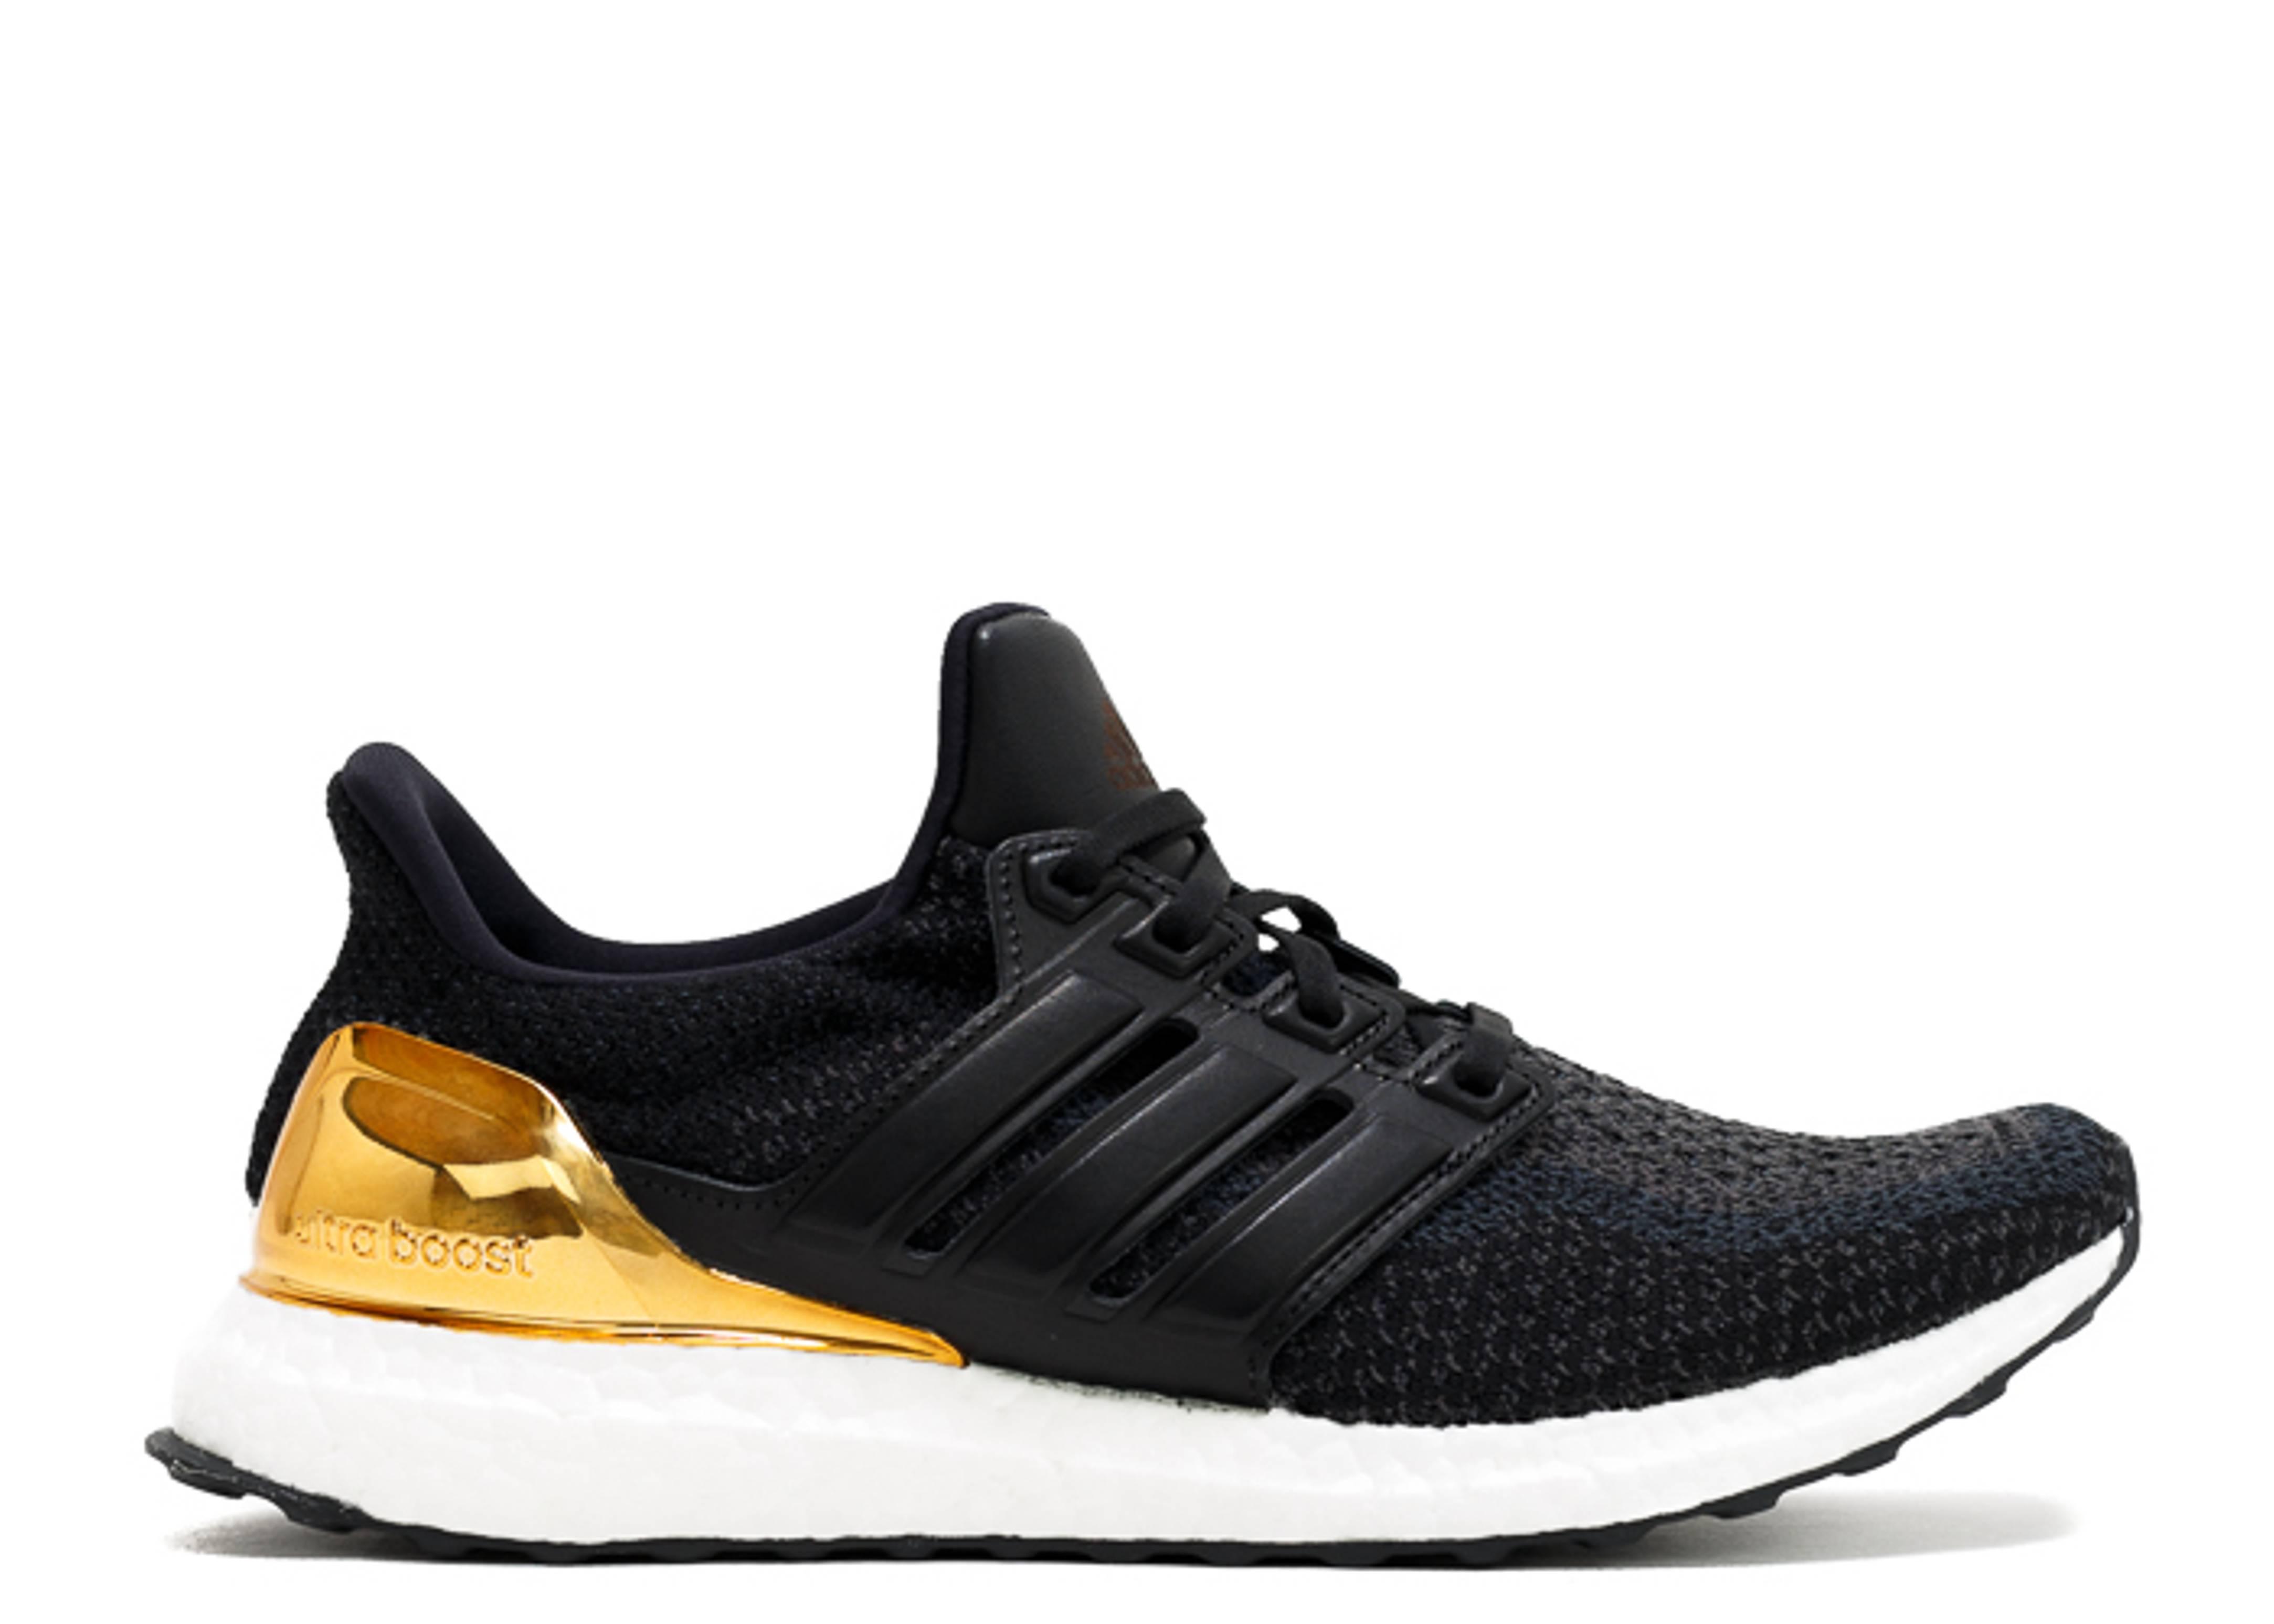 Adidas Ultra Boost Metallic Gold